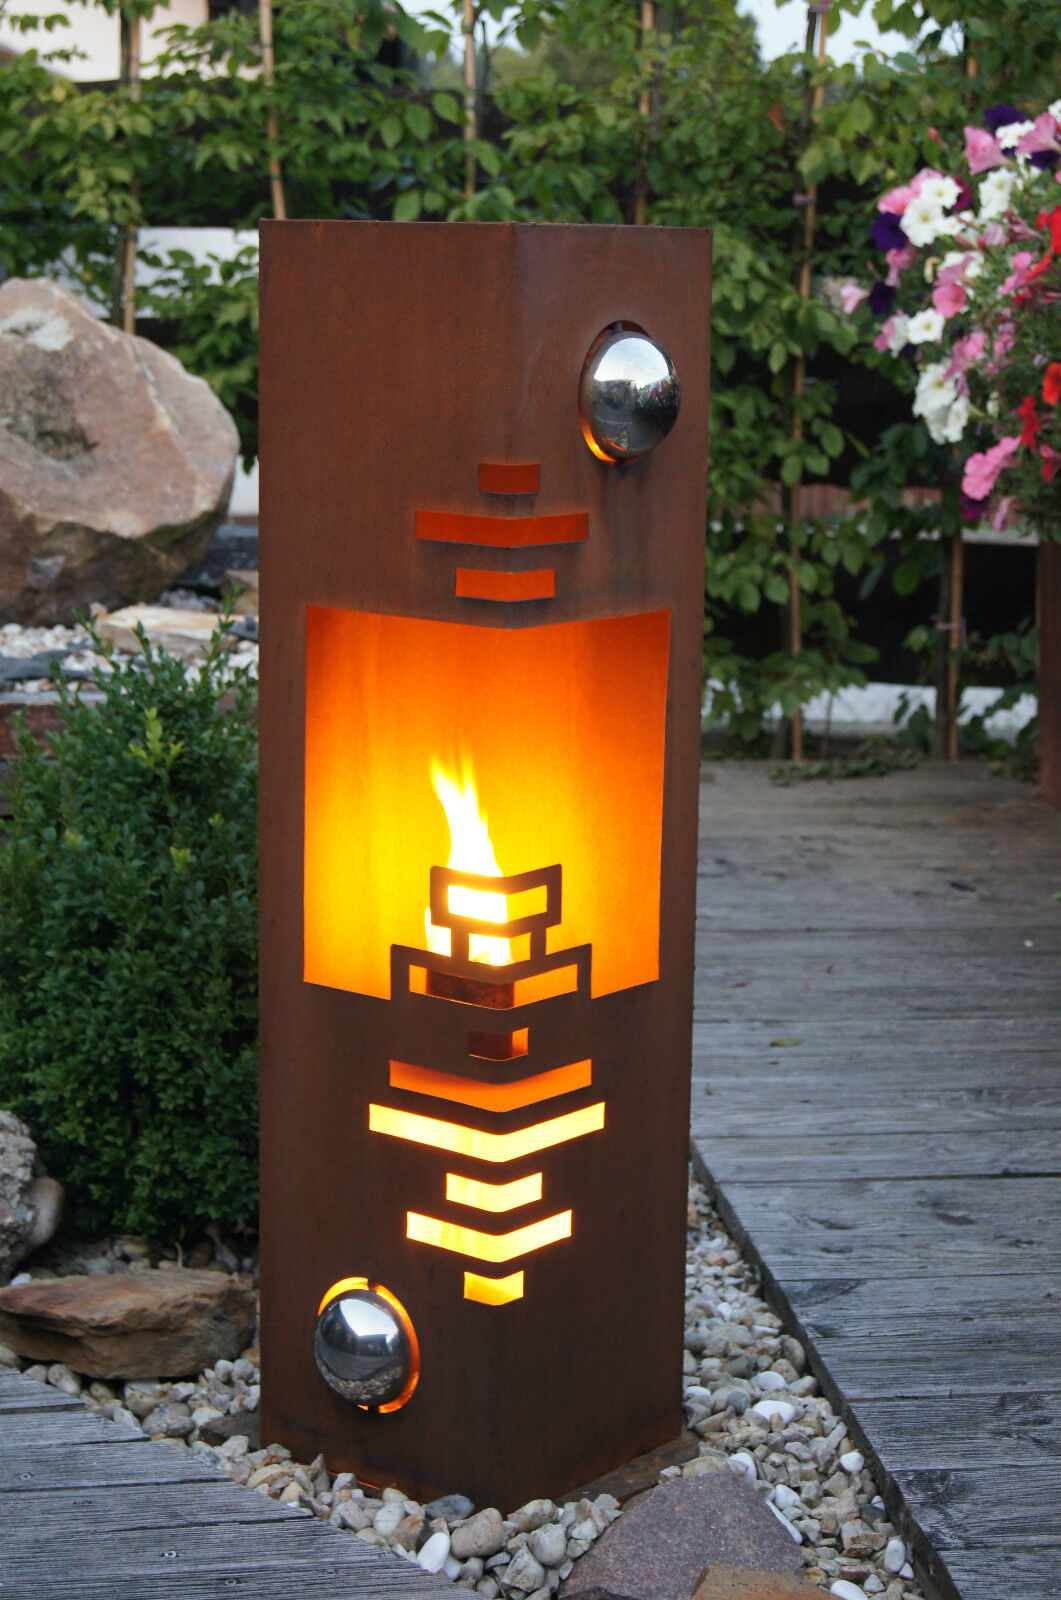 Feuer s ule modern edelrost rost metall gartendeko stele fackel windlicht eur 79 00 picclick nl - Metall gartendeko ...